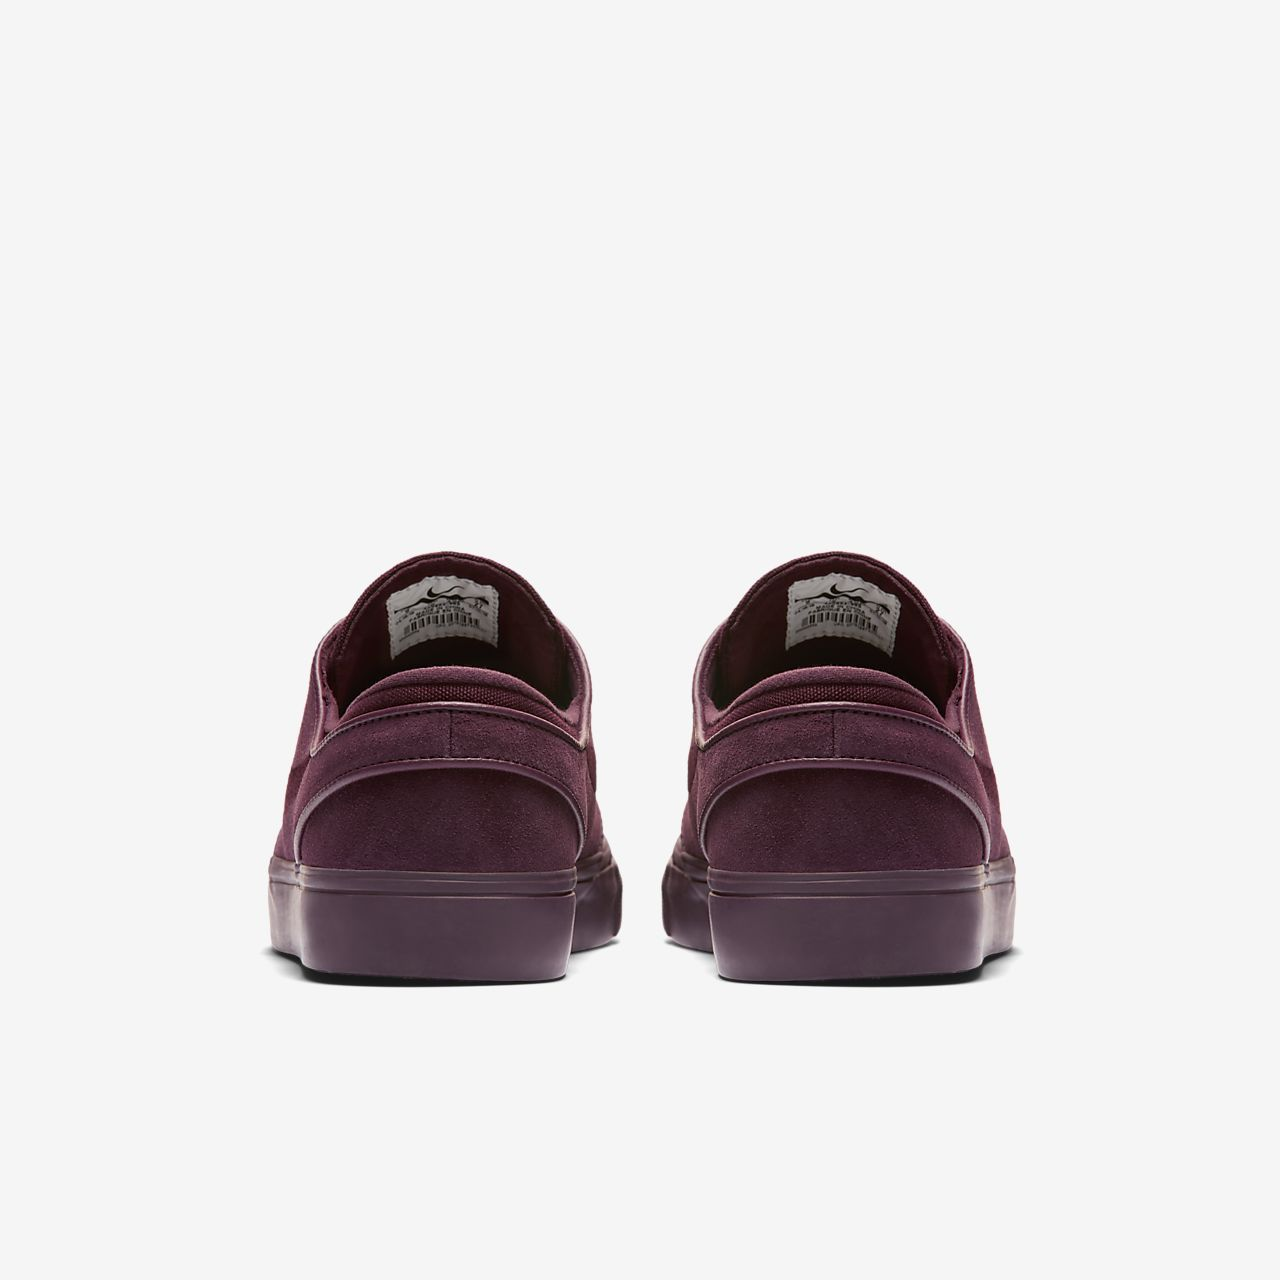 promo code ba6ed d4dc6 ... Nike Zoom Stefan Janoski Men s Skate Shoe